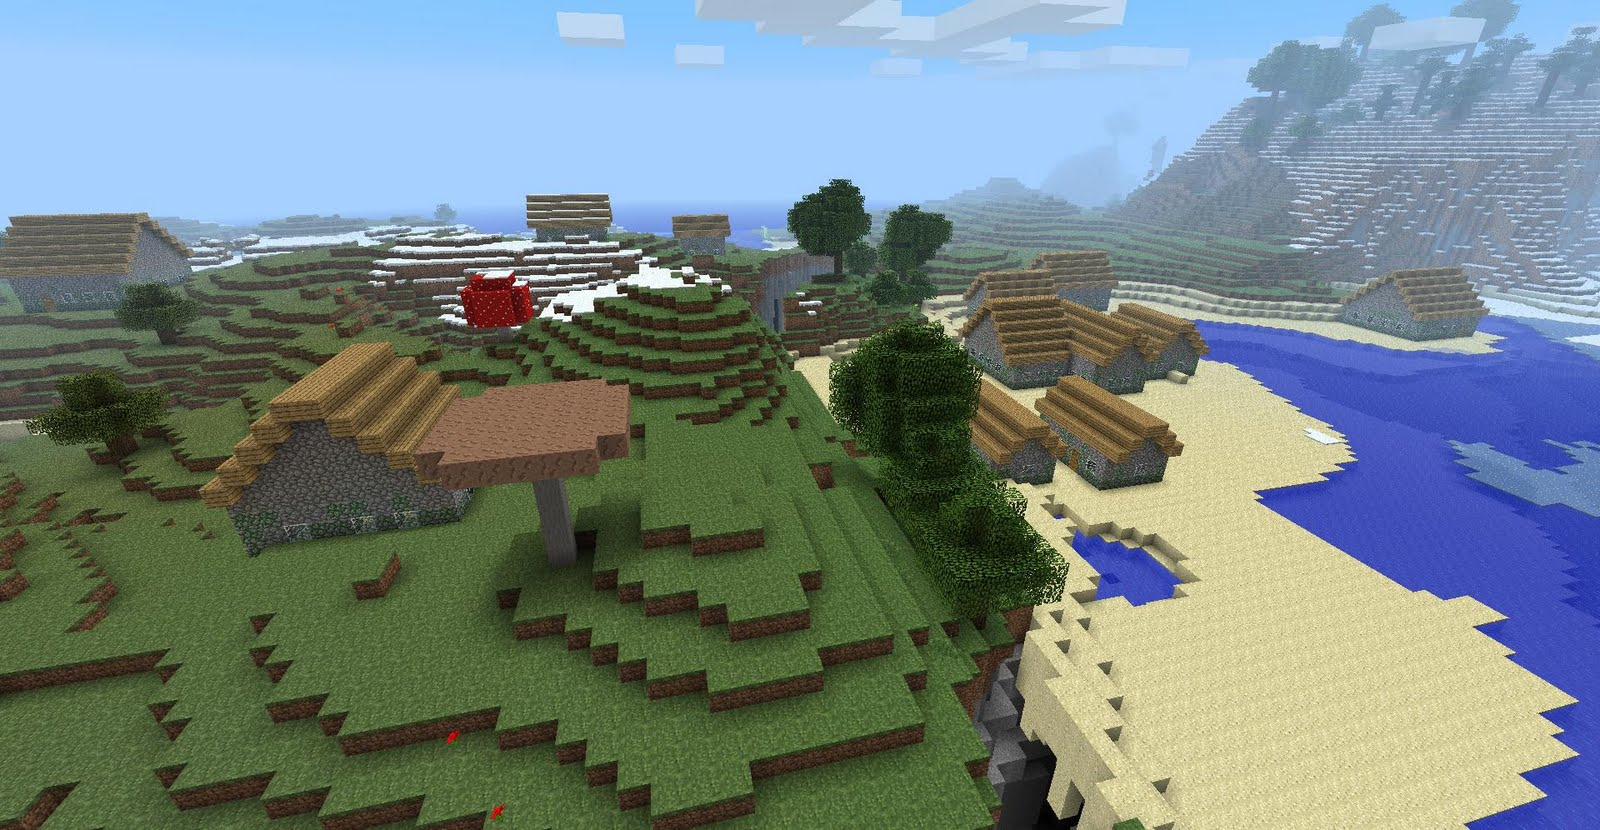 http://2.bp.blogspot.com/-YP2wkv_Z2nk/Thd5yc_IFvI/AAAAAAAAAAw/aLy8mMOXGpM/s1600/Minecraft+1.8+%25281%2529.jpg